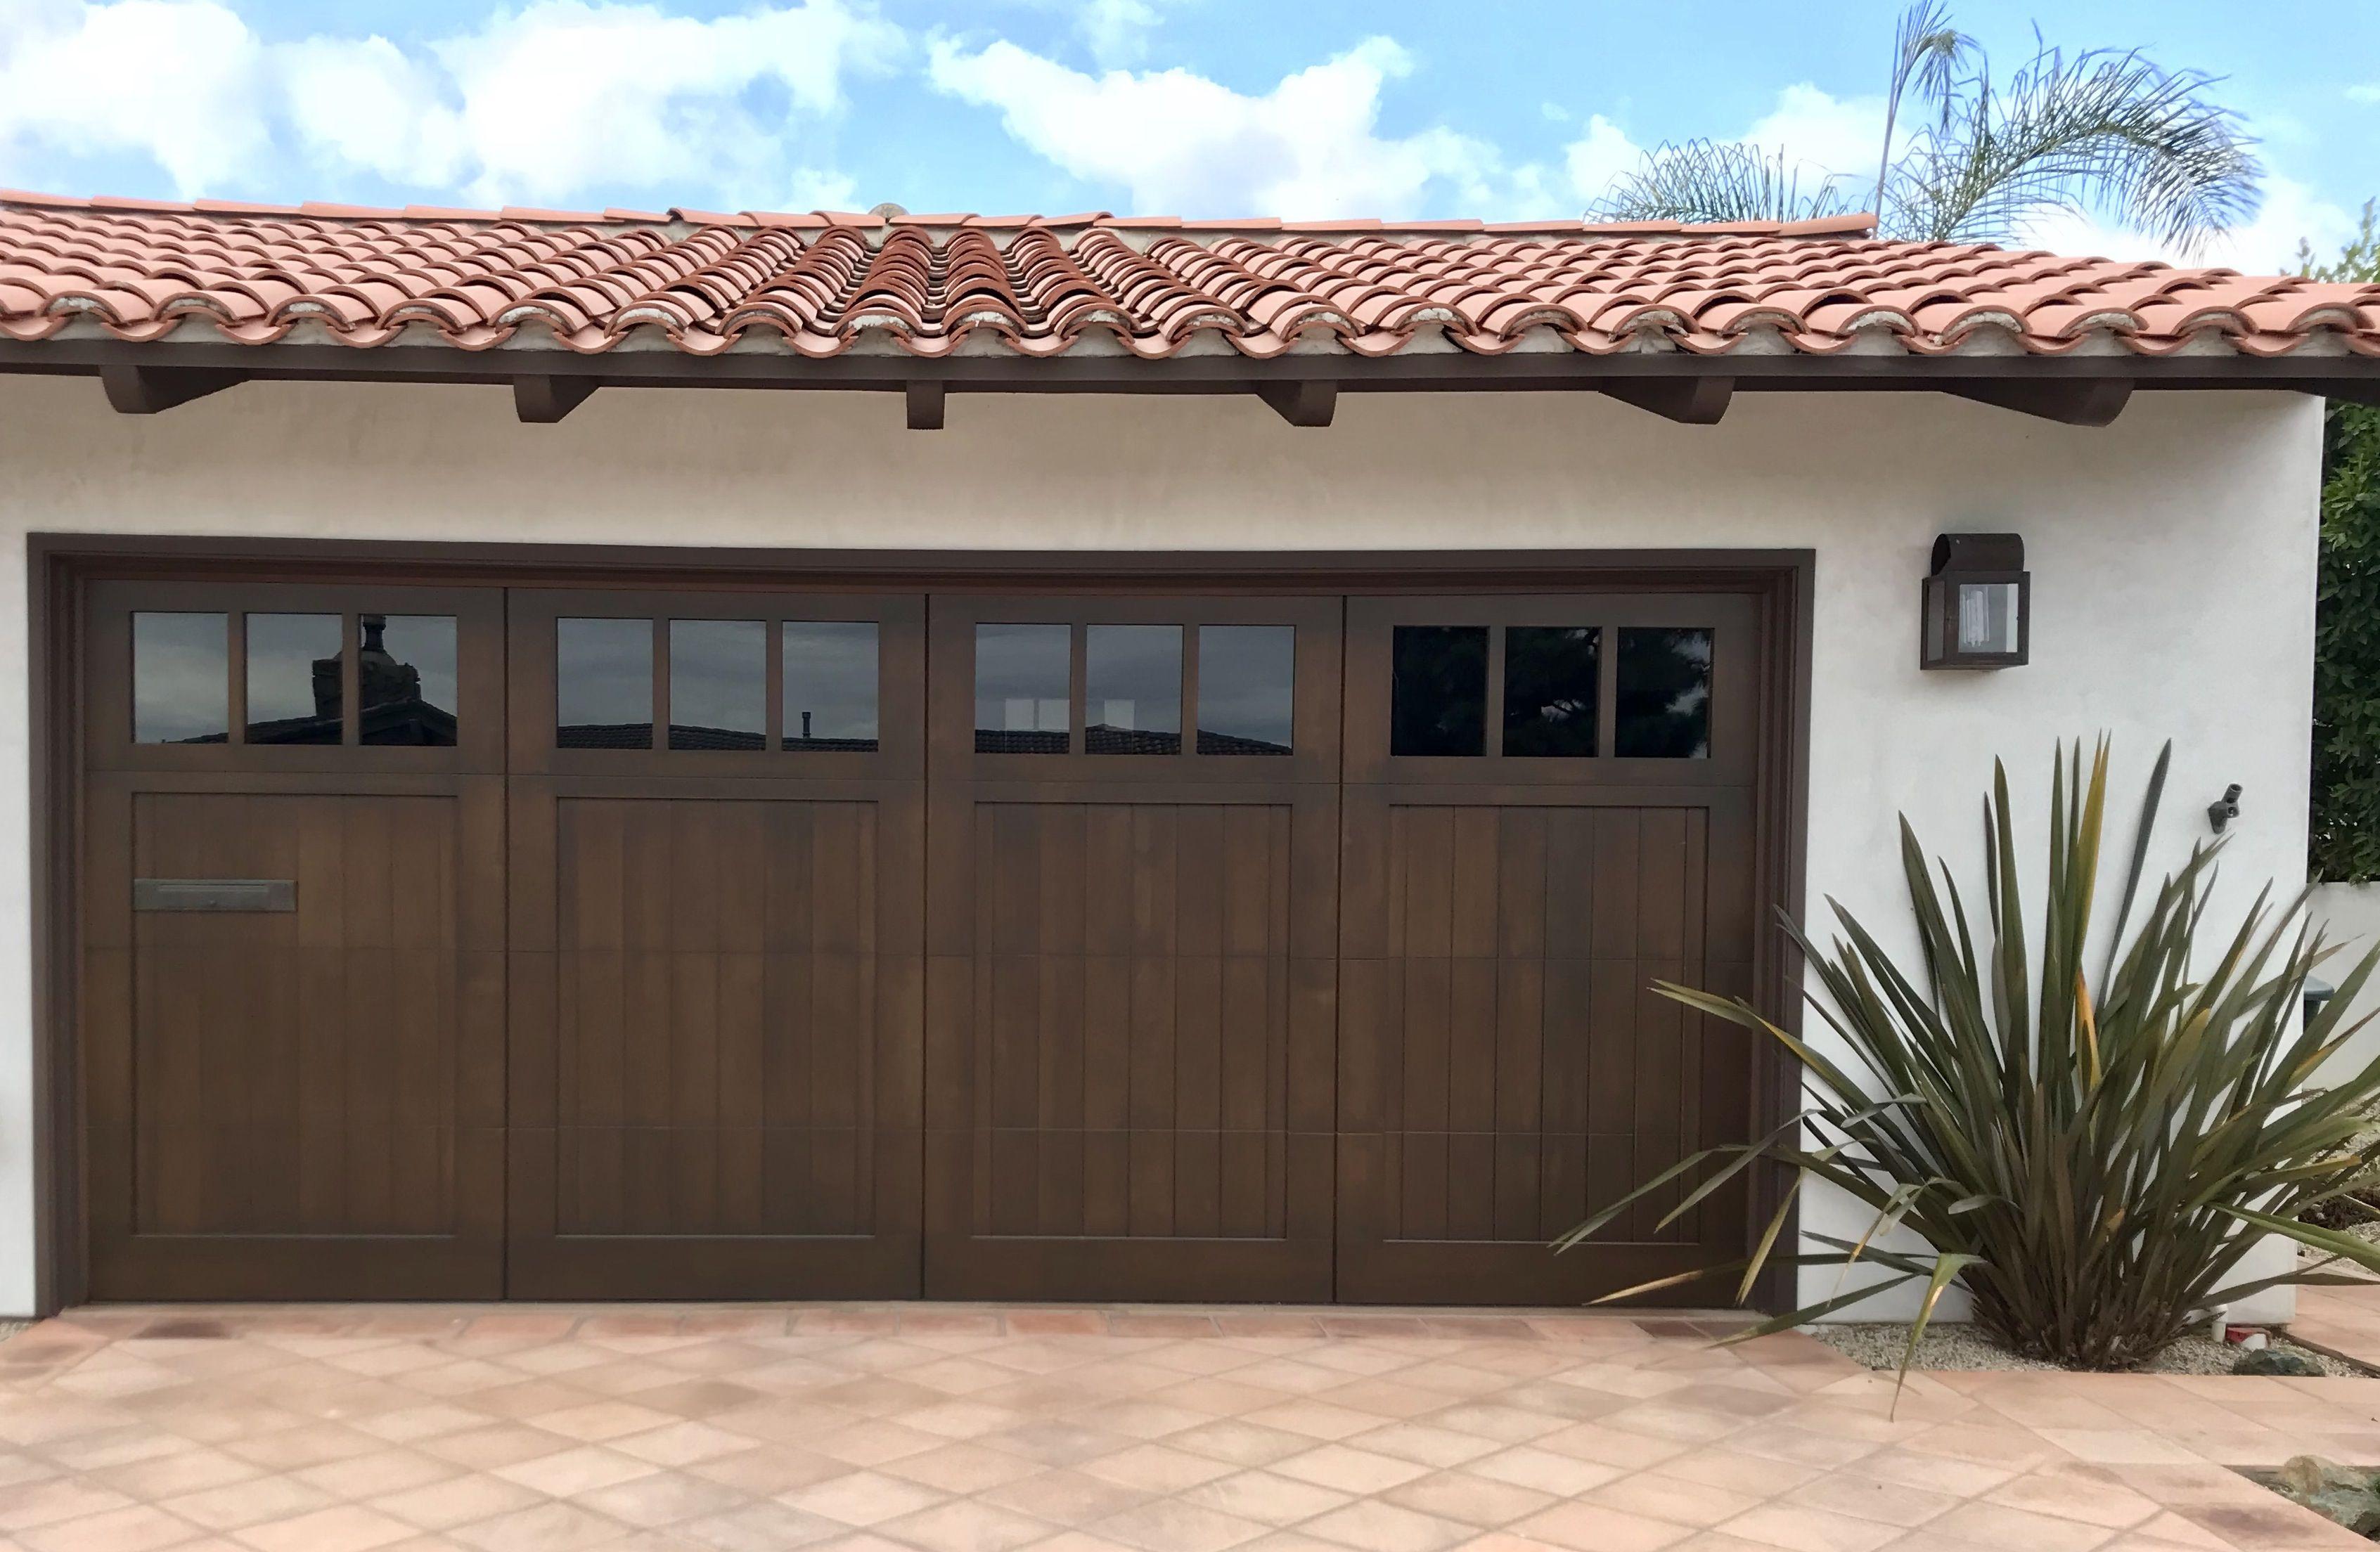 Spanish Collection Garage Doors